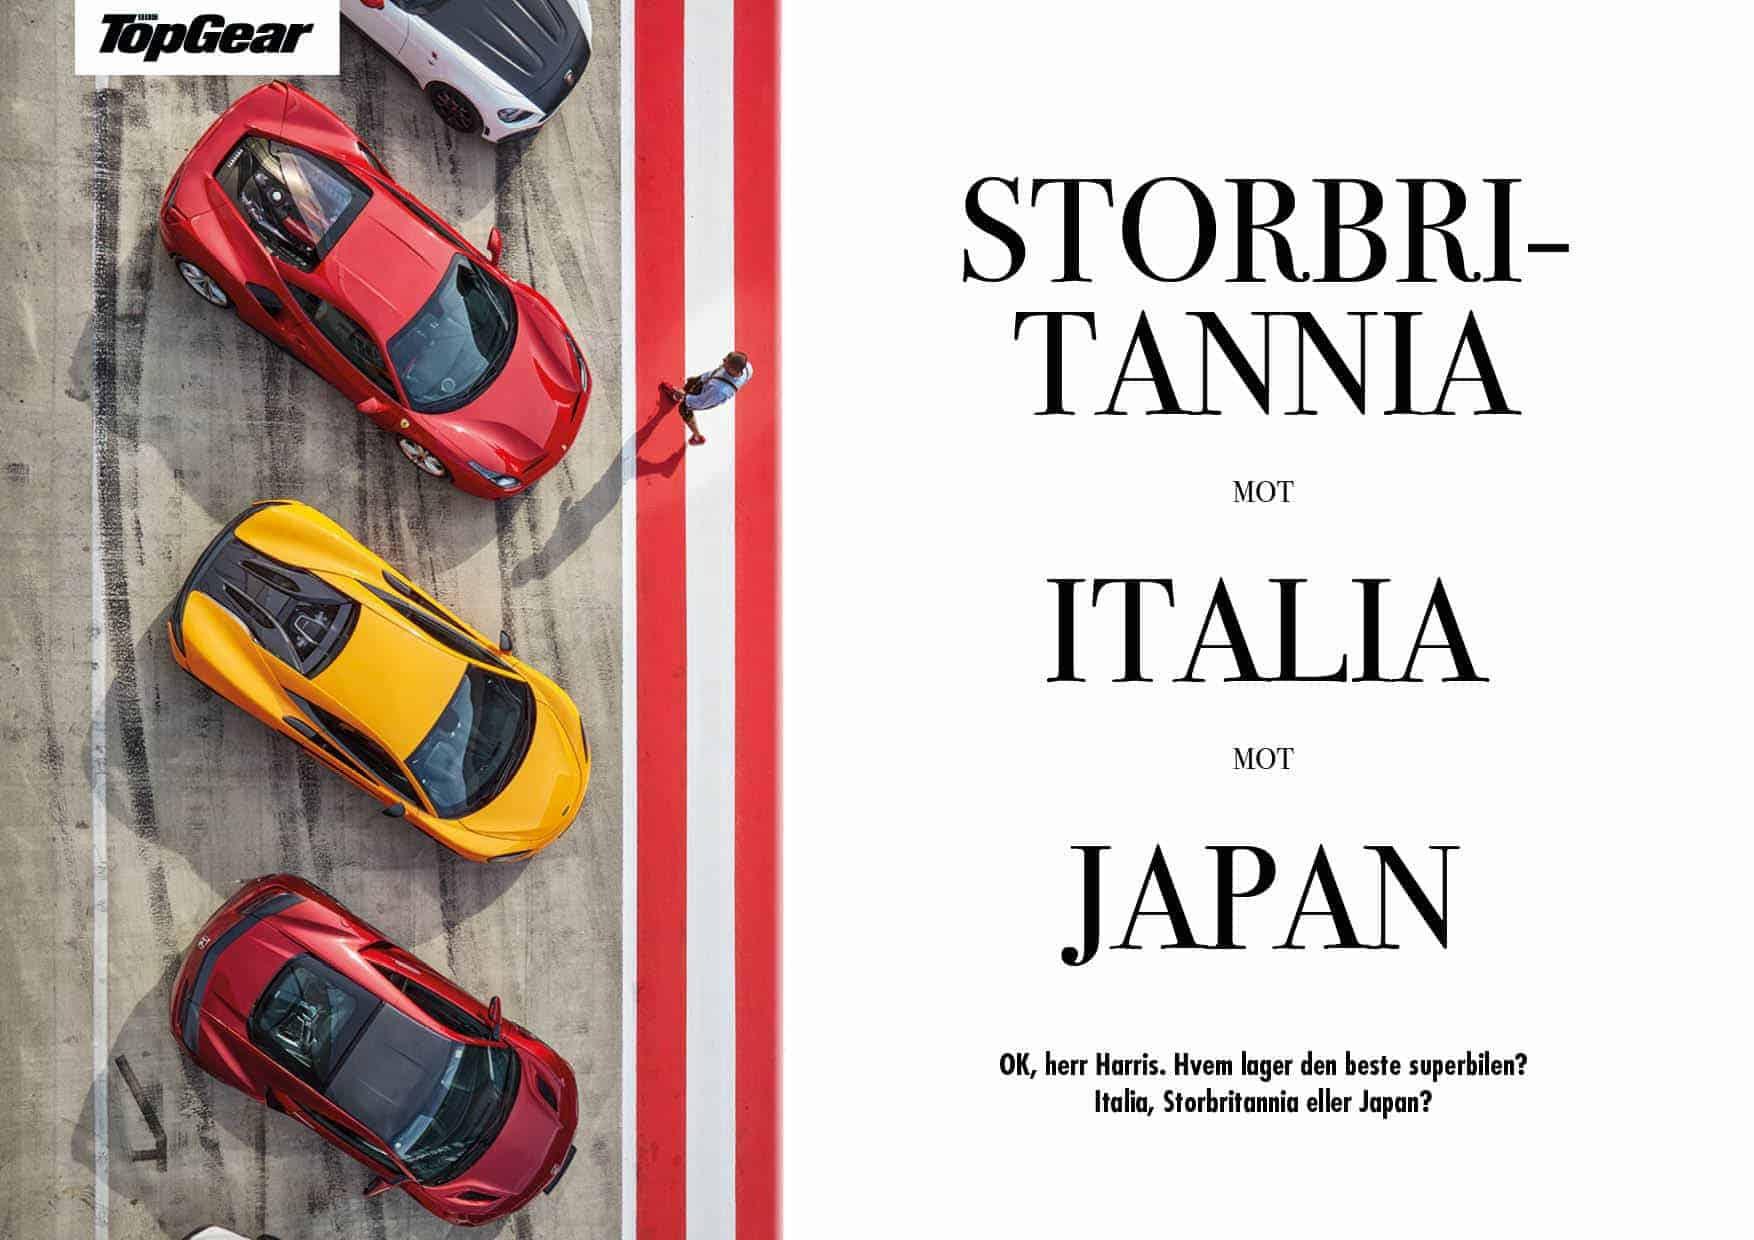 Storbritannia mot Italia mot Japan